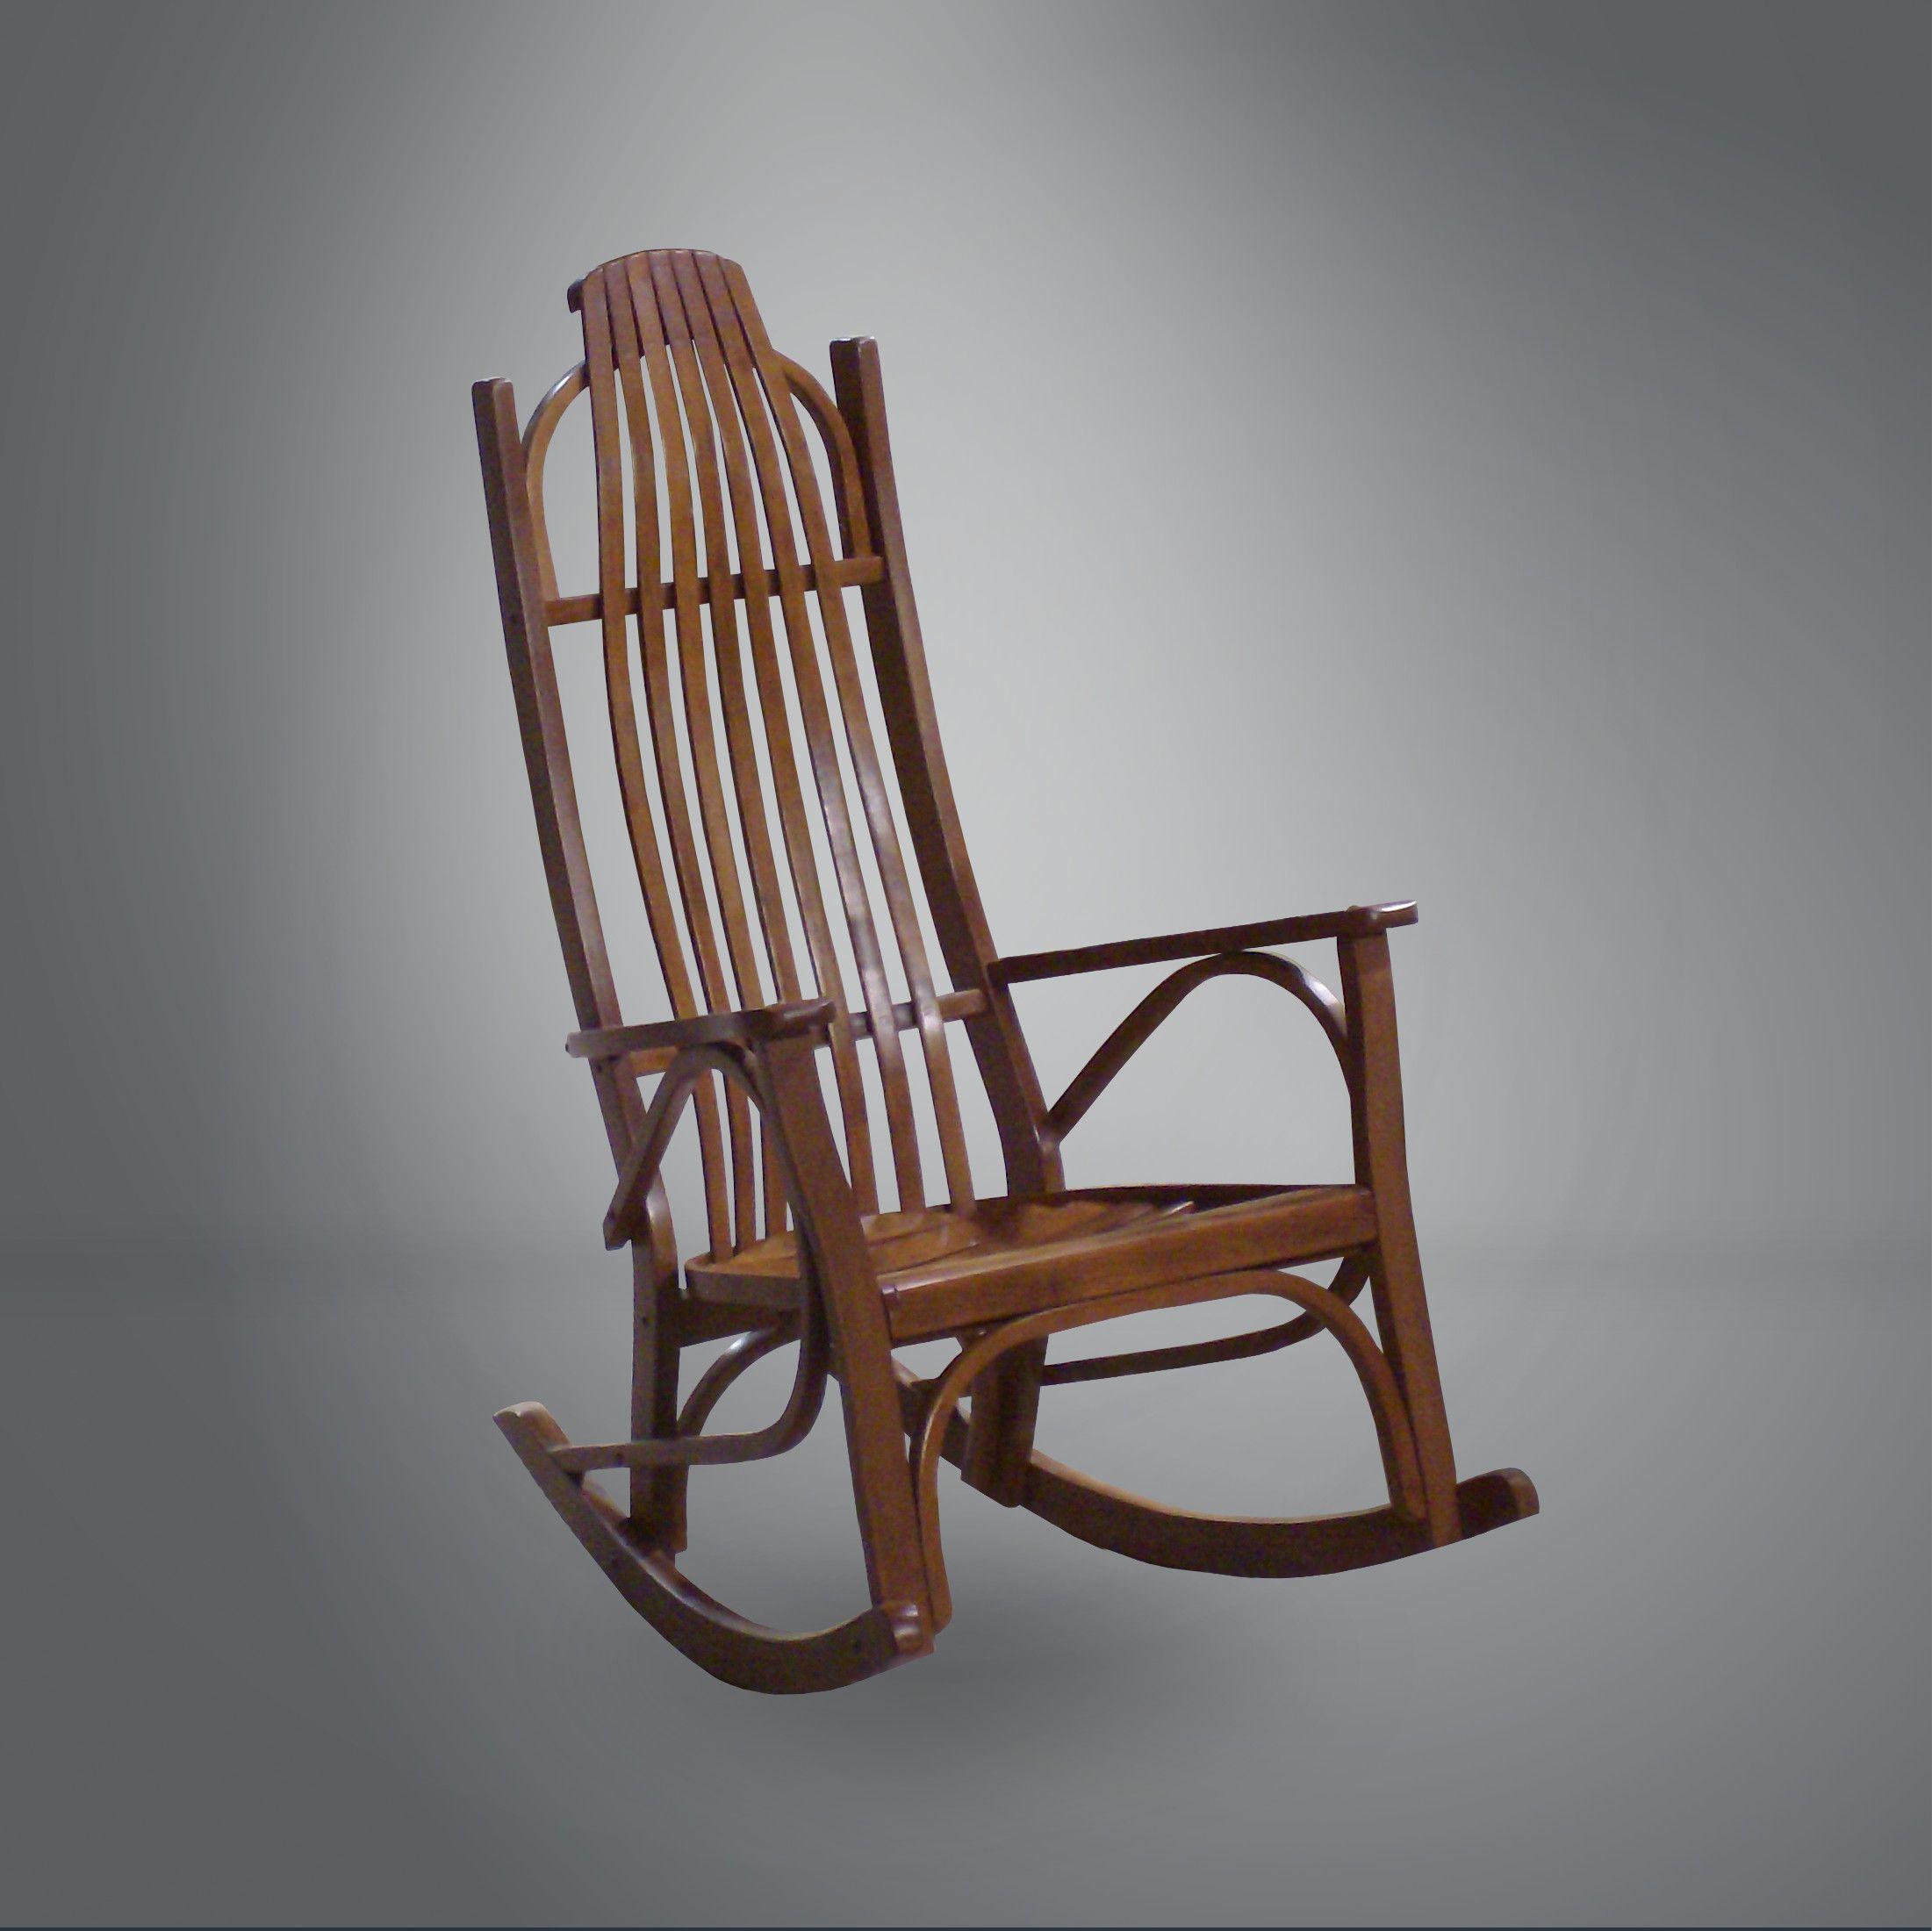 Solid Seat Rocking Chair Rocking chair, Wood rocking